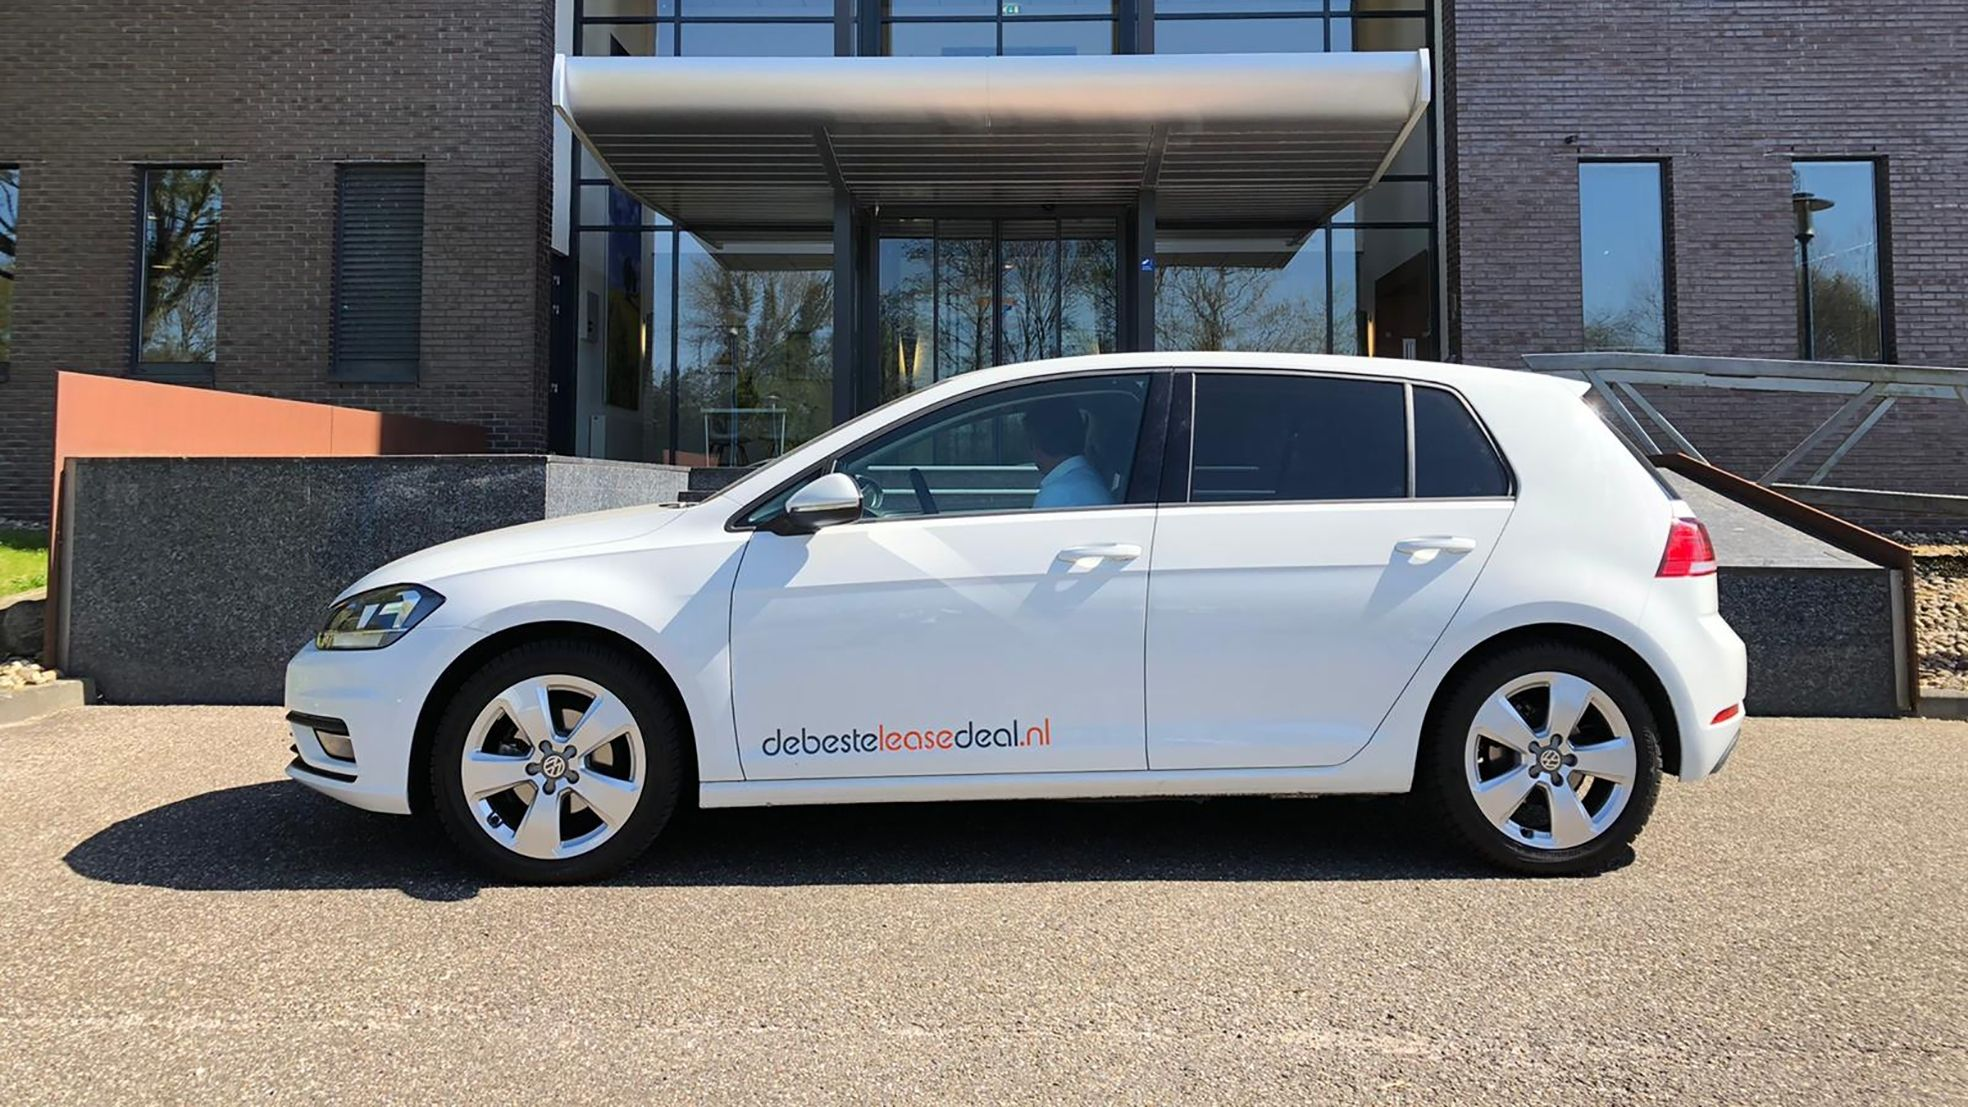 Beste lease deal auto